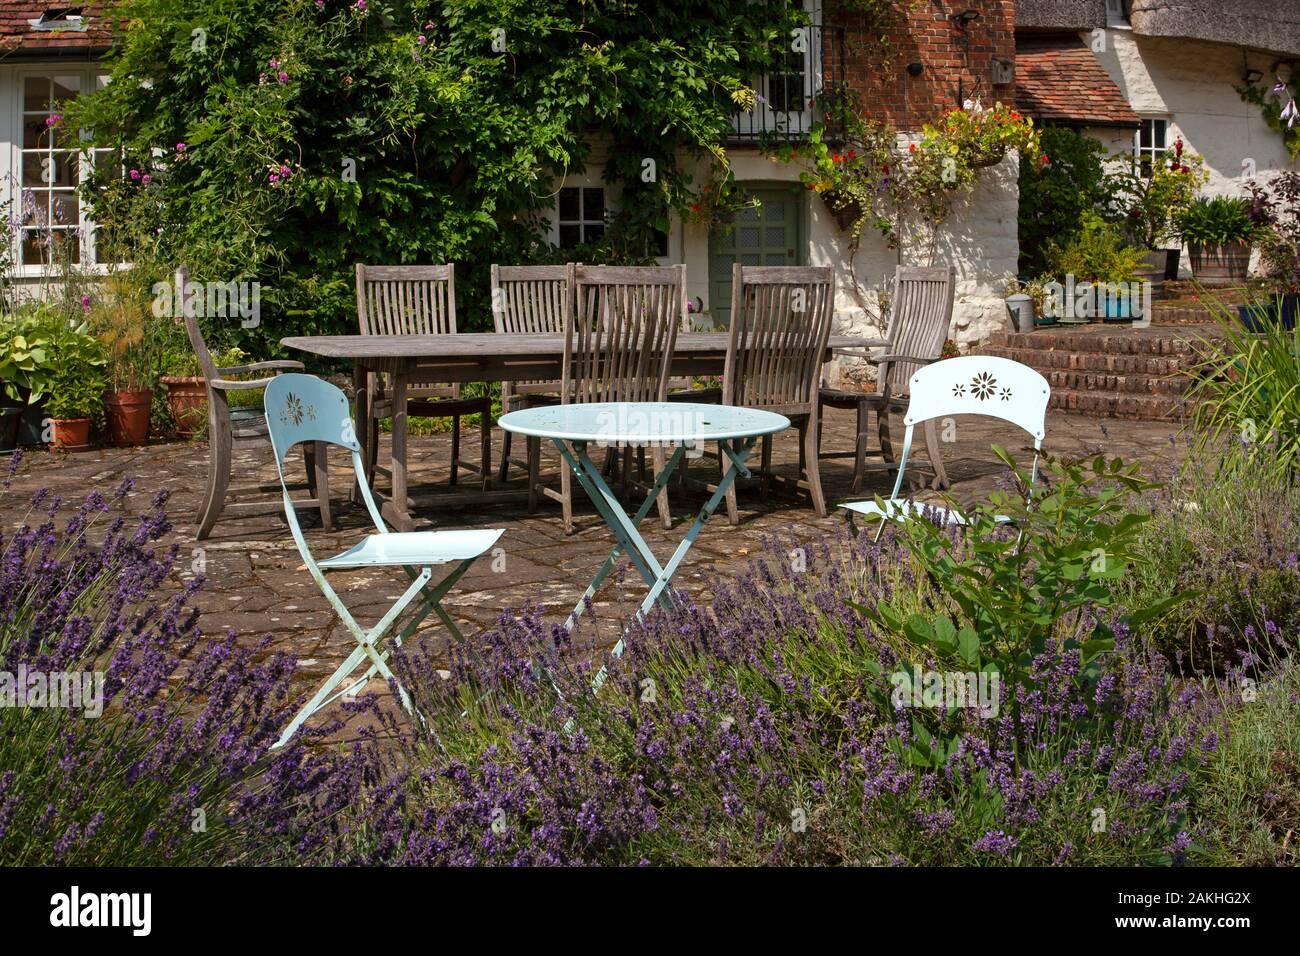 Metal Garden Seating Furniture On Stone Patio In English Summer Garden Stock Photo Alamy